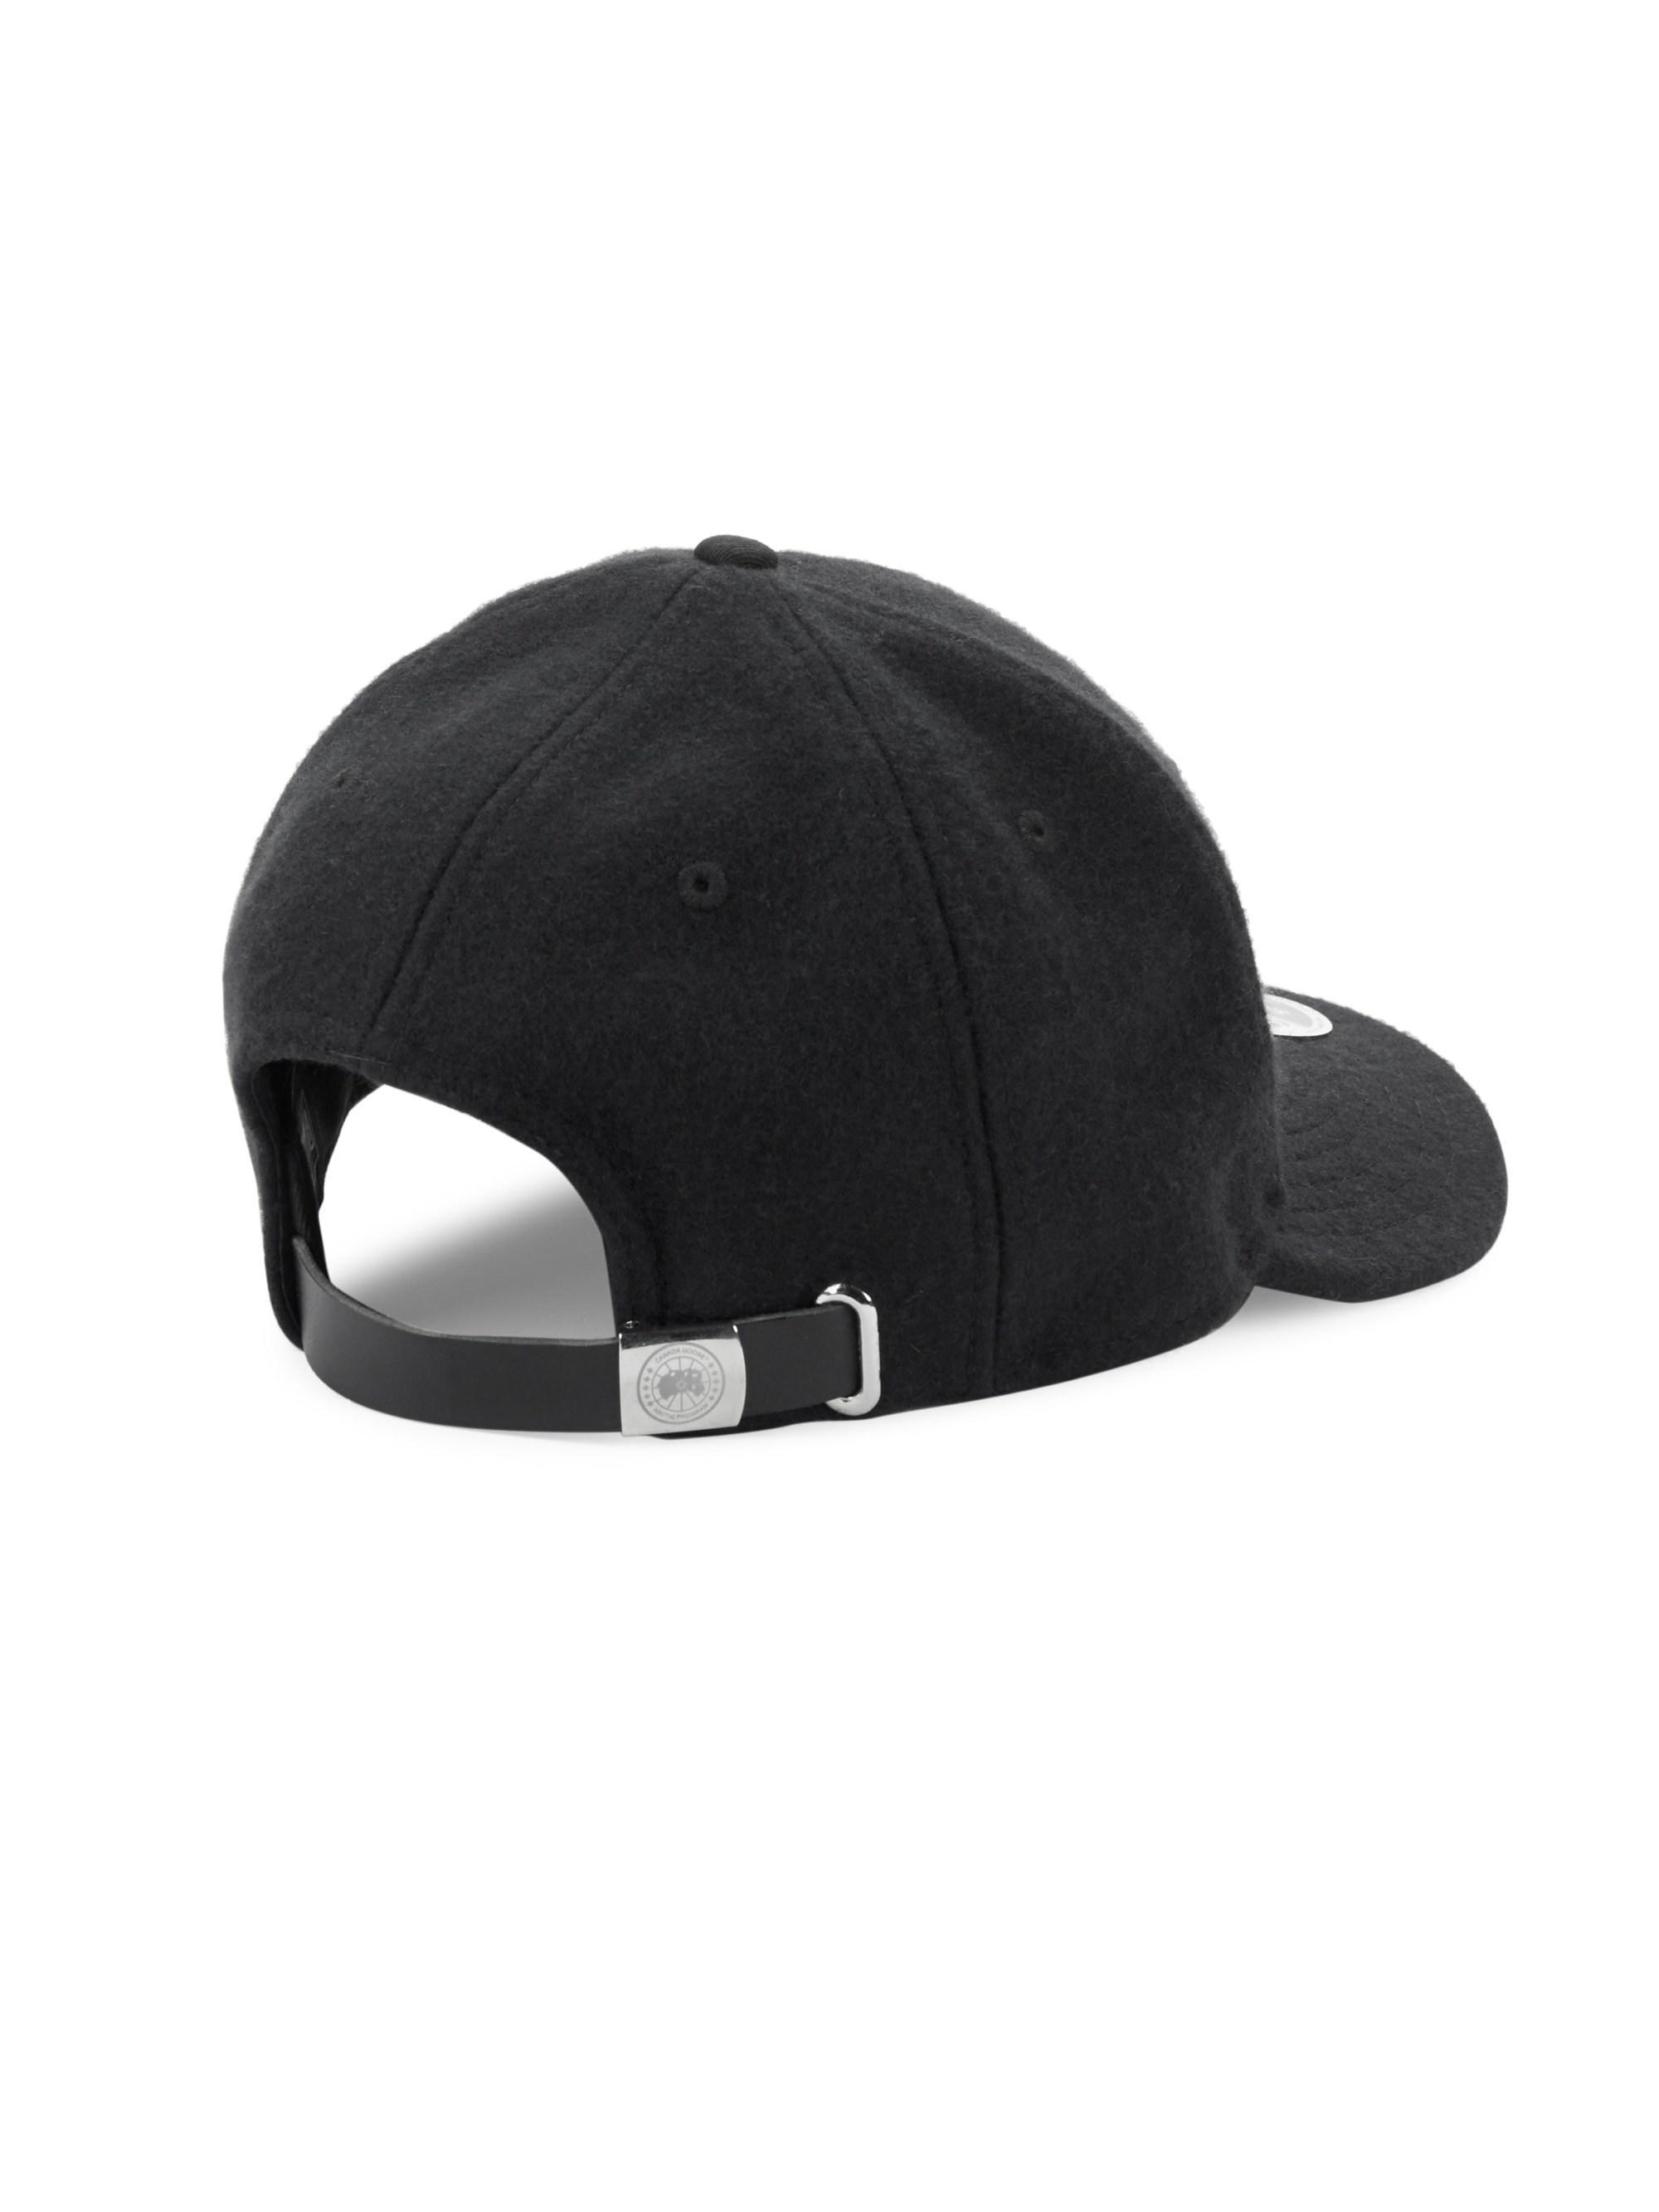 9cd24dbc9c7 Canada Goose - Black Melton Wool Baseball Hat for Men - Lyst. View  fullscreen